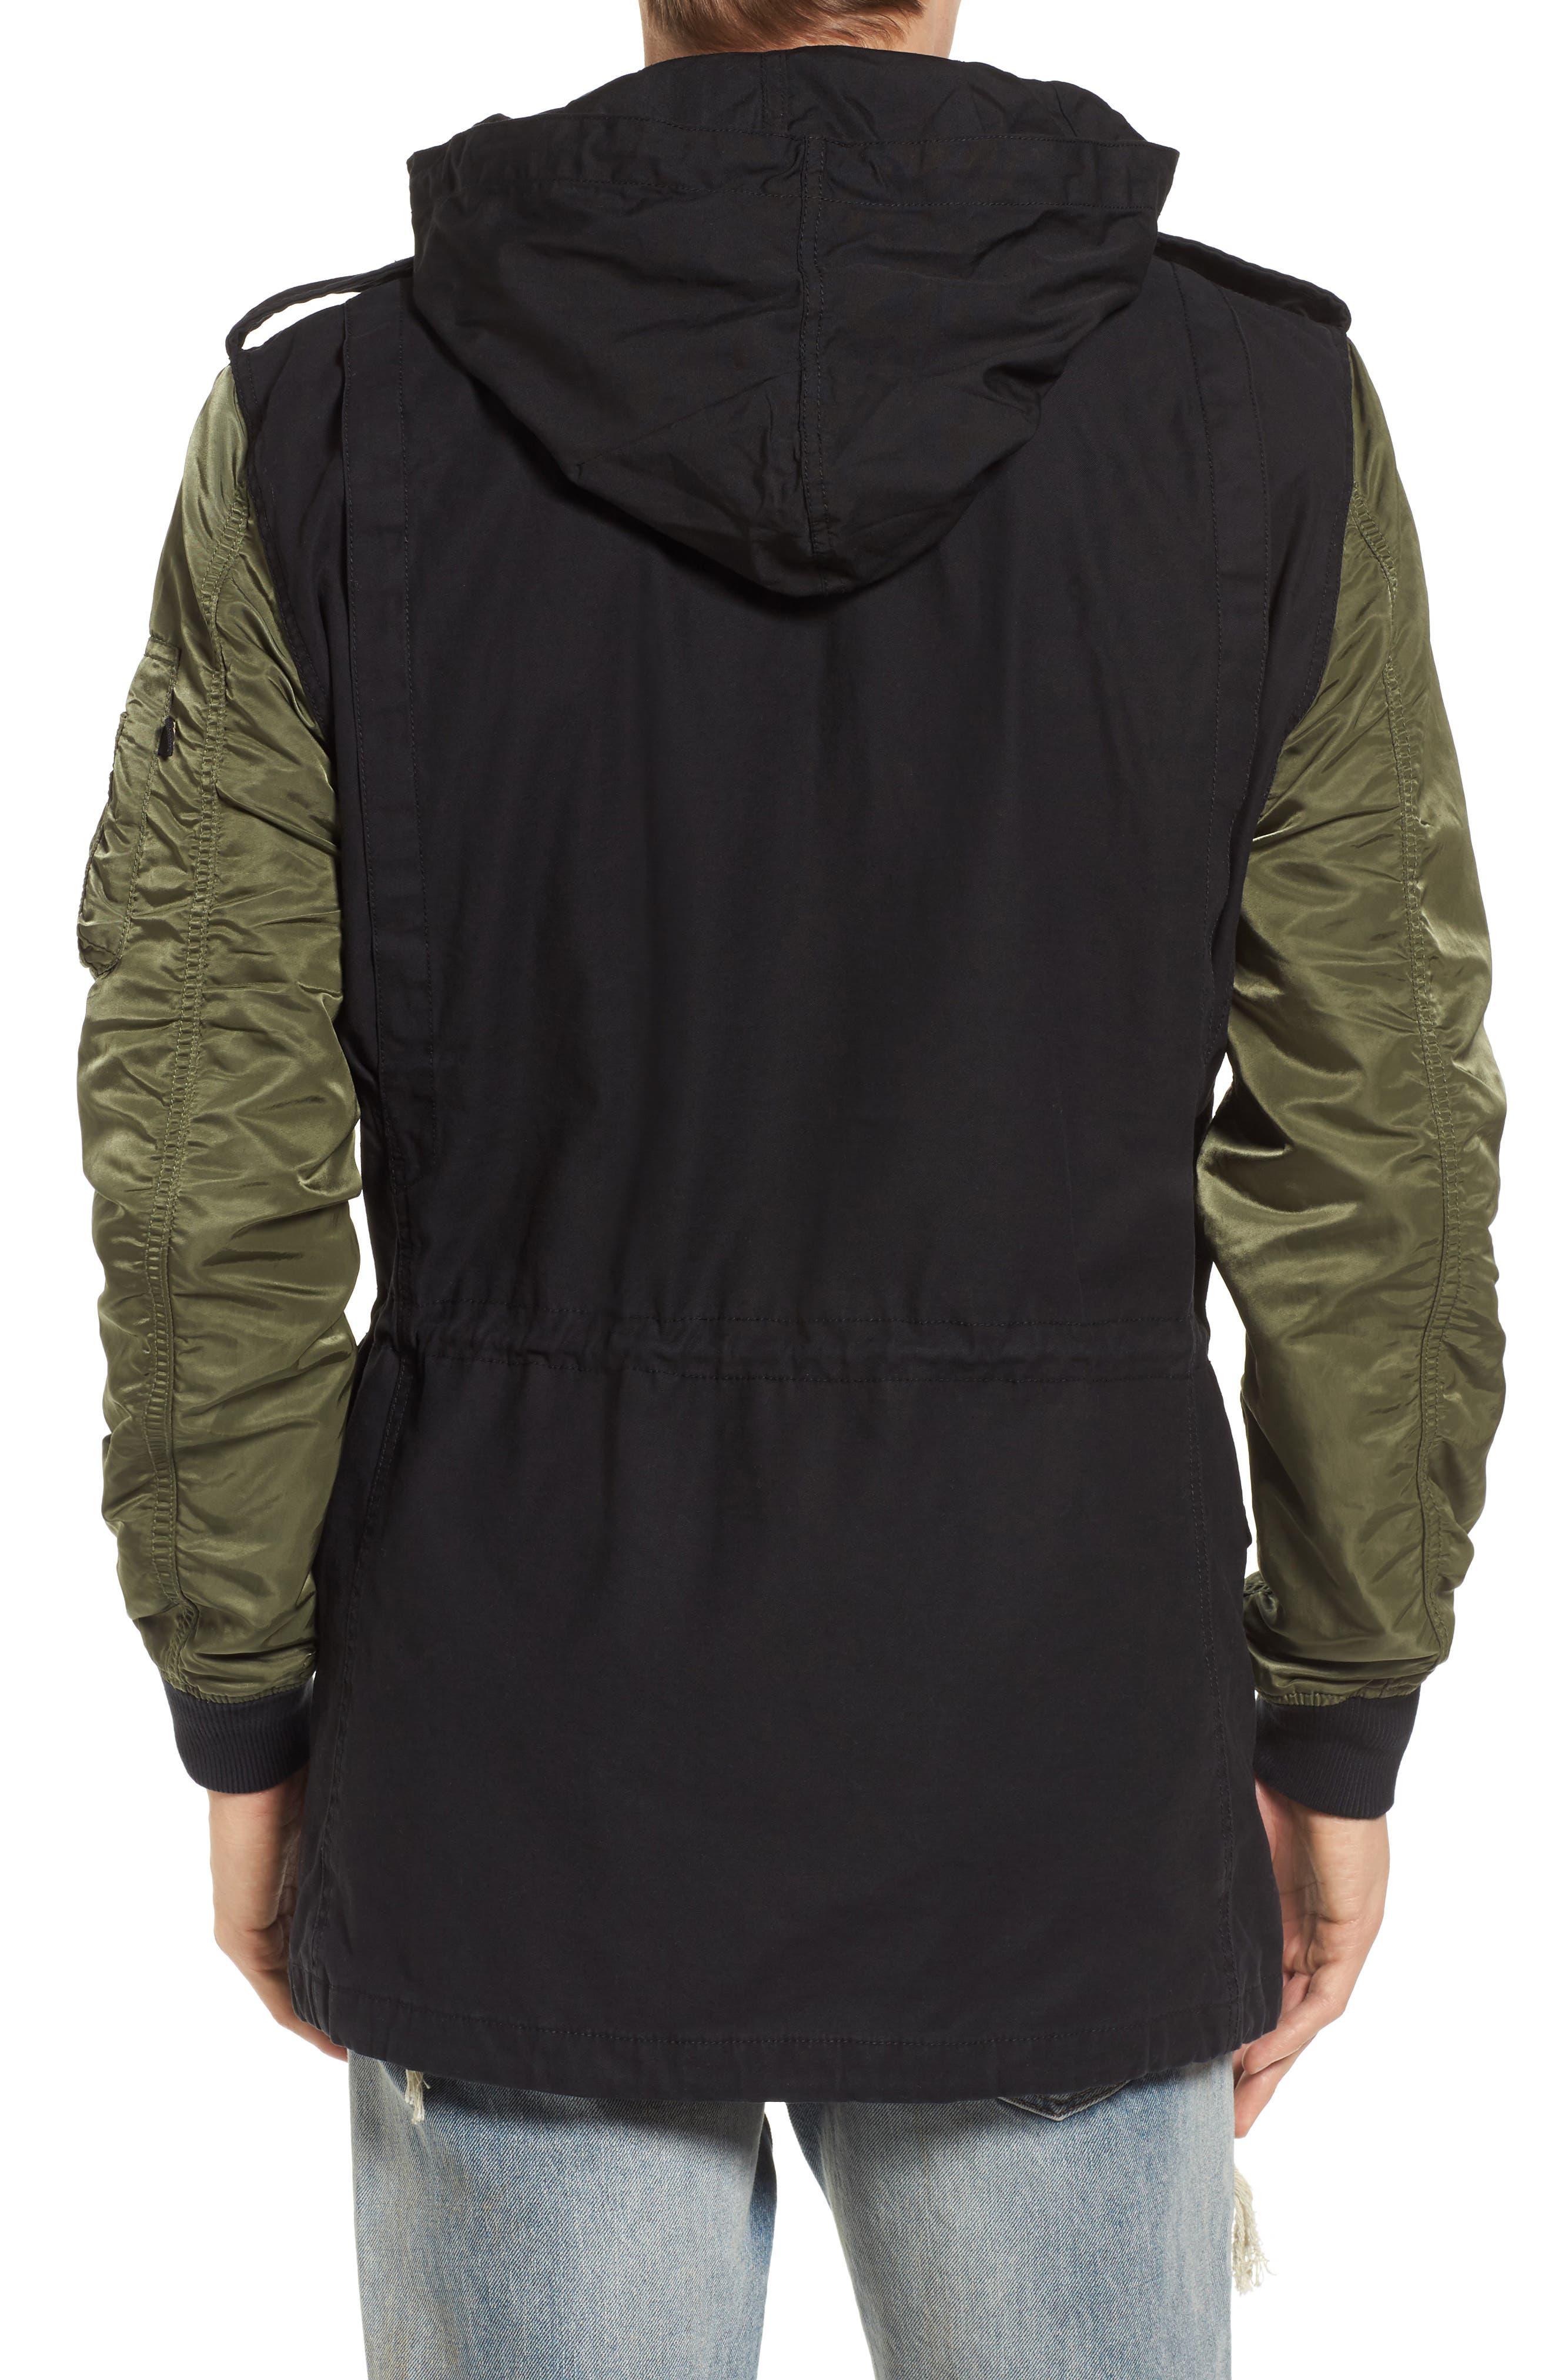 Fusion Field Coat,                             Alternate thumbnail 2, color,                             Black/ Sage